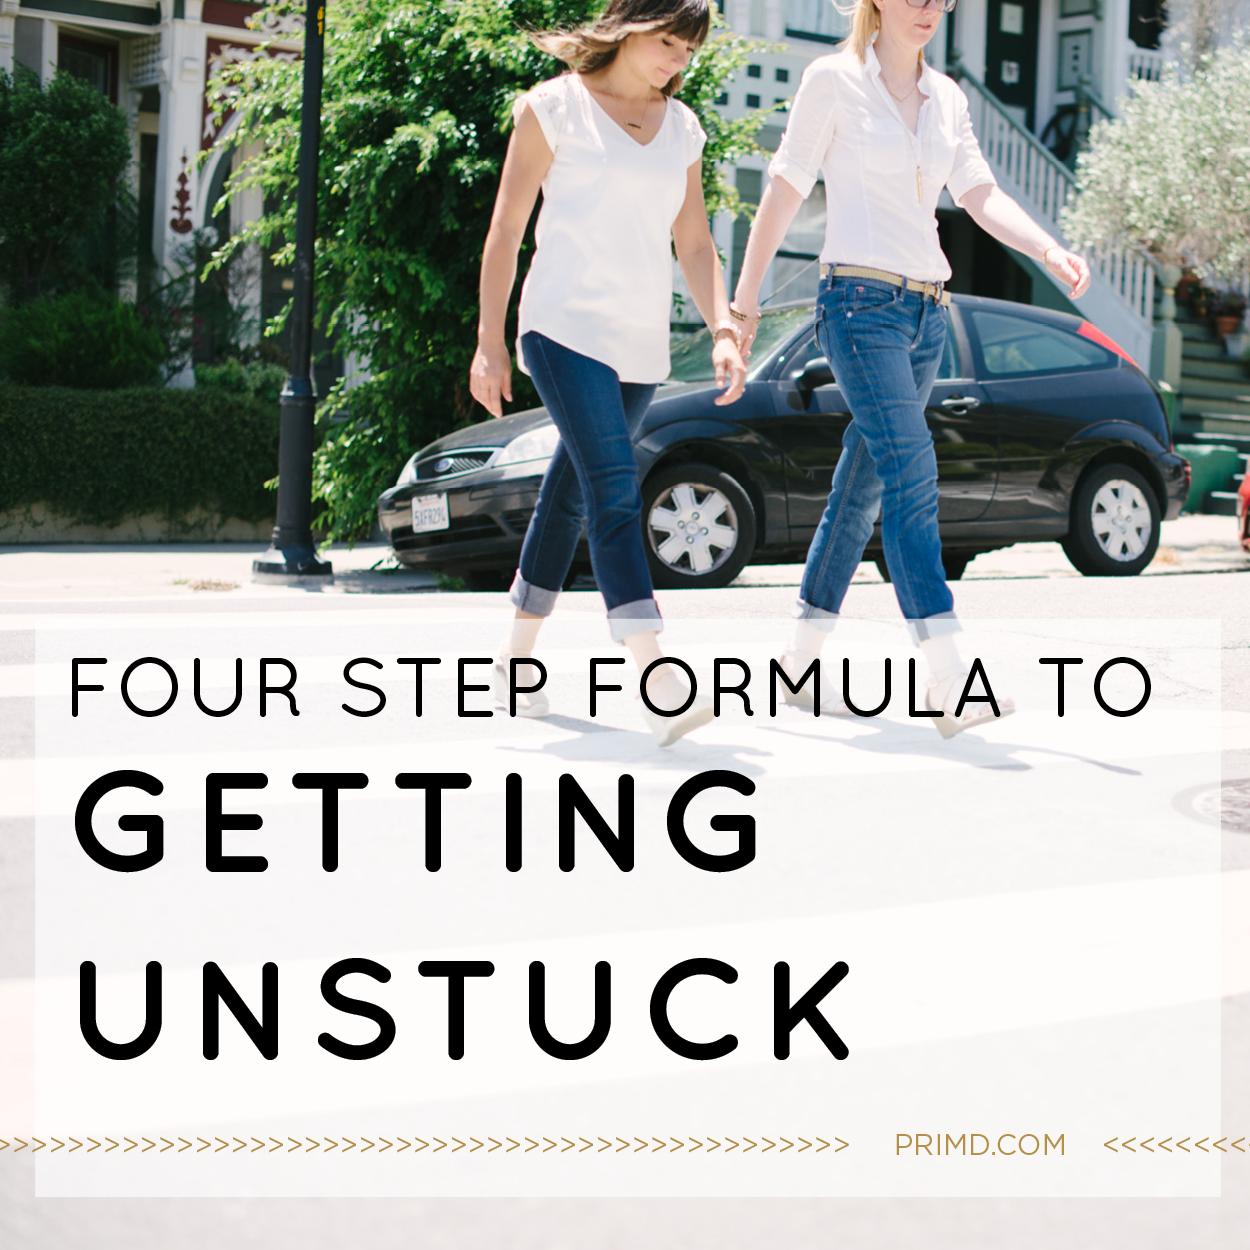 Primd Marketing - Four Step Formula to Getting Unstuck